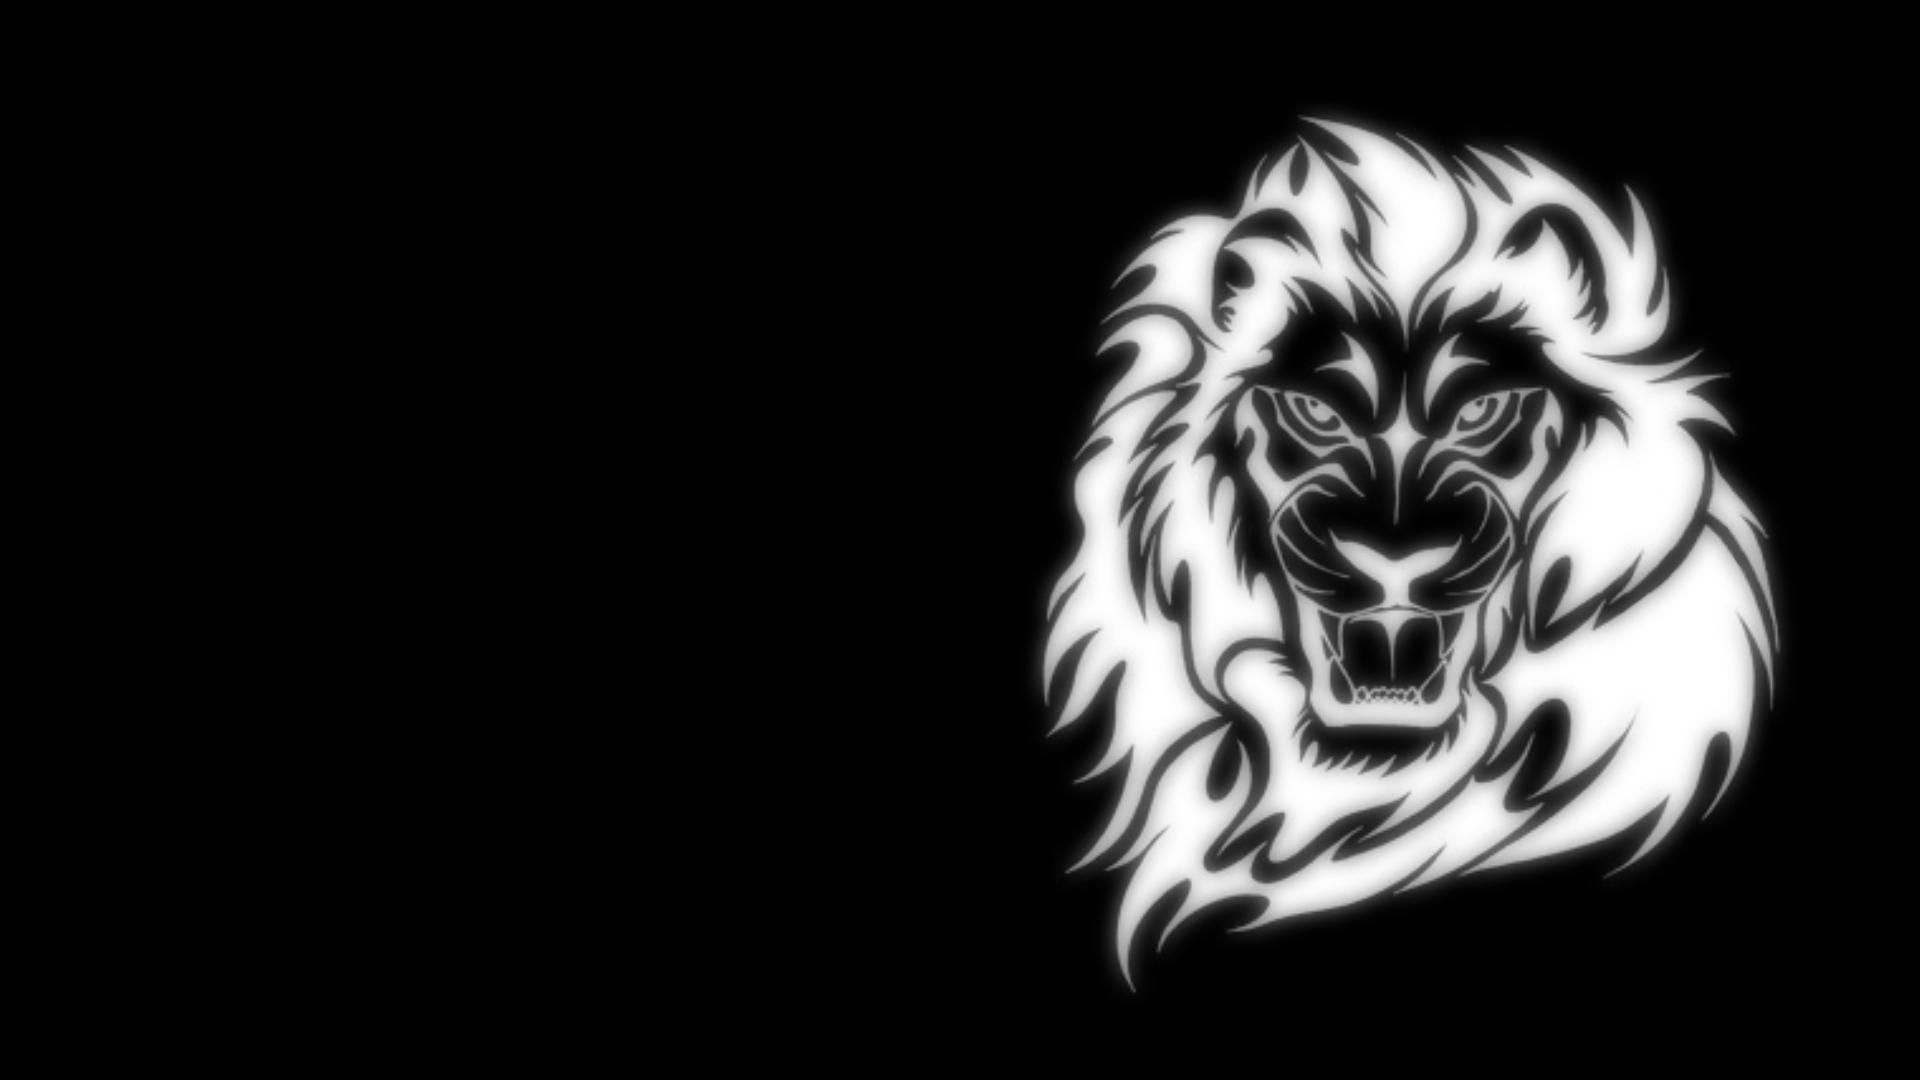 Awesome Lion Wallpaper Lion Photos Download Hd Wallpaper In 2020 Lion Wallpaper Lions Photos Black And White Lion